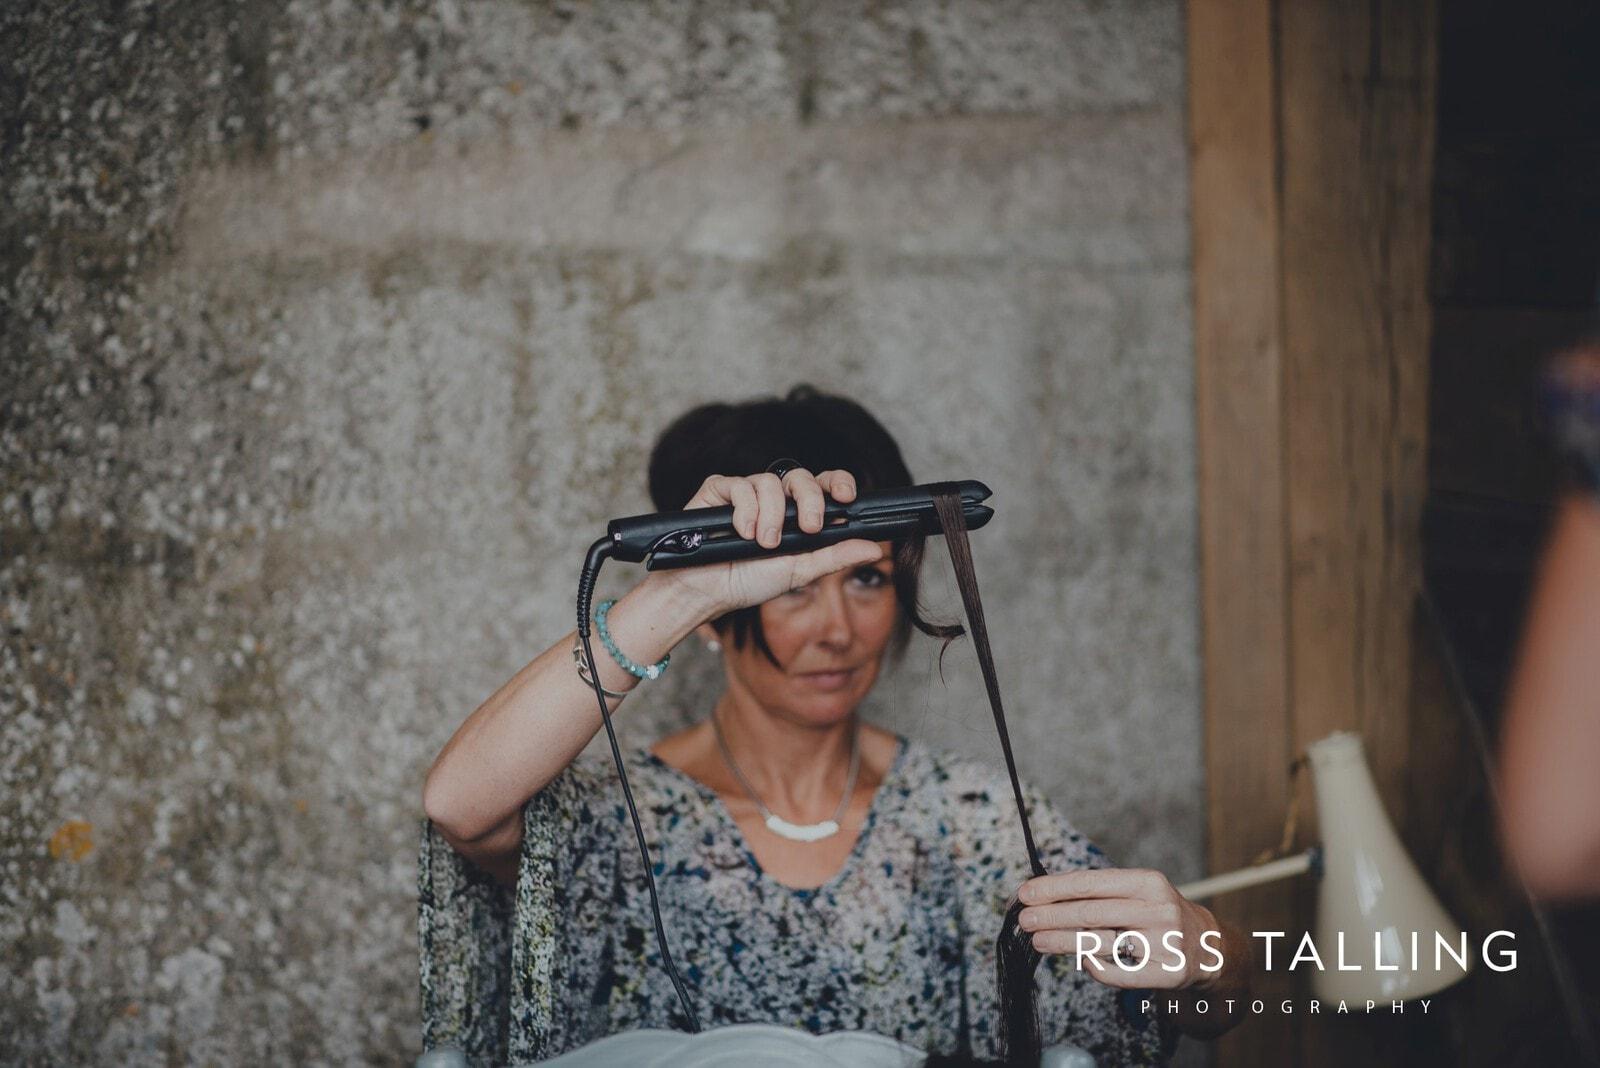 zara-adey-nancarow-farm-wedding-photography-cornwall_0007